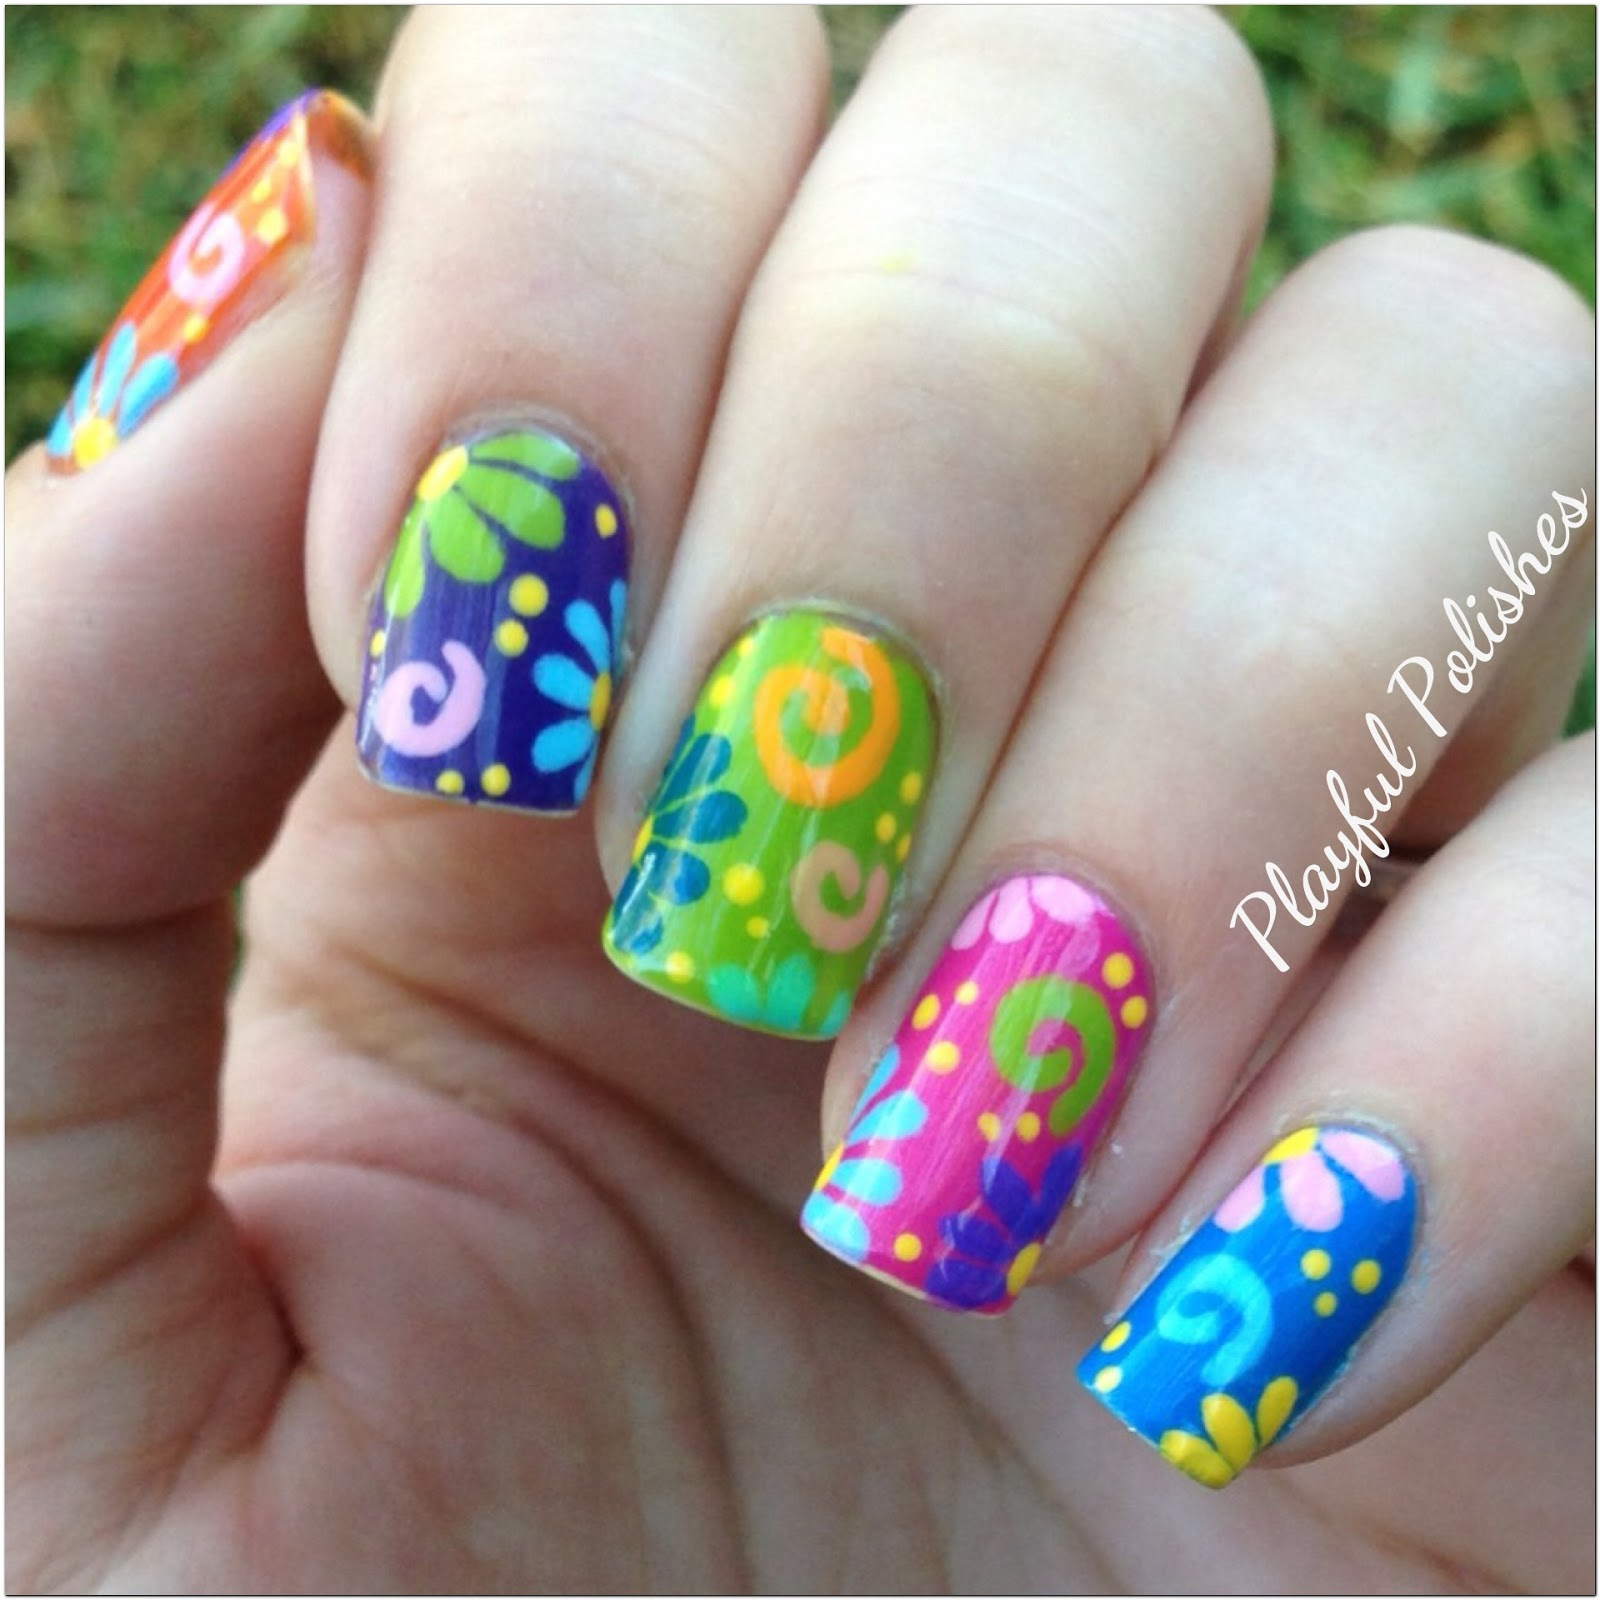 Playful Polishes: JUNE NAIL ART CHALLENGE: FLOWER NAILS